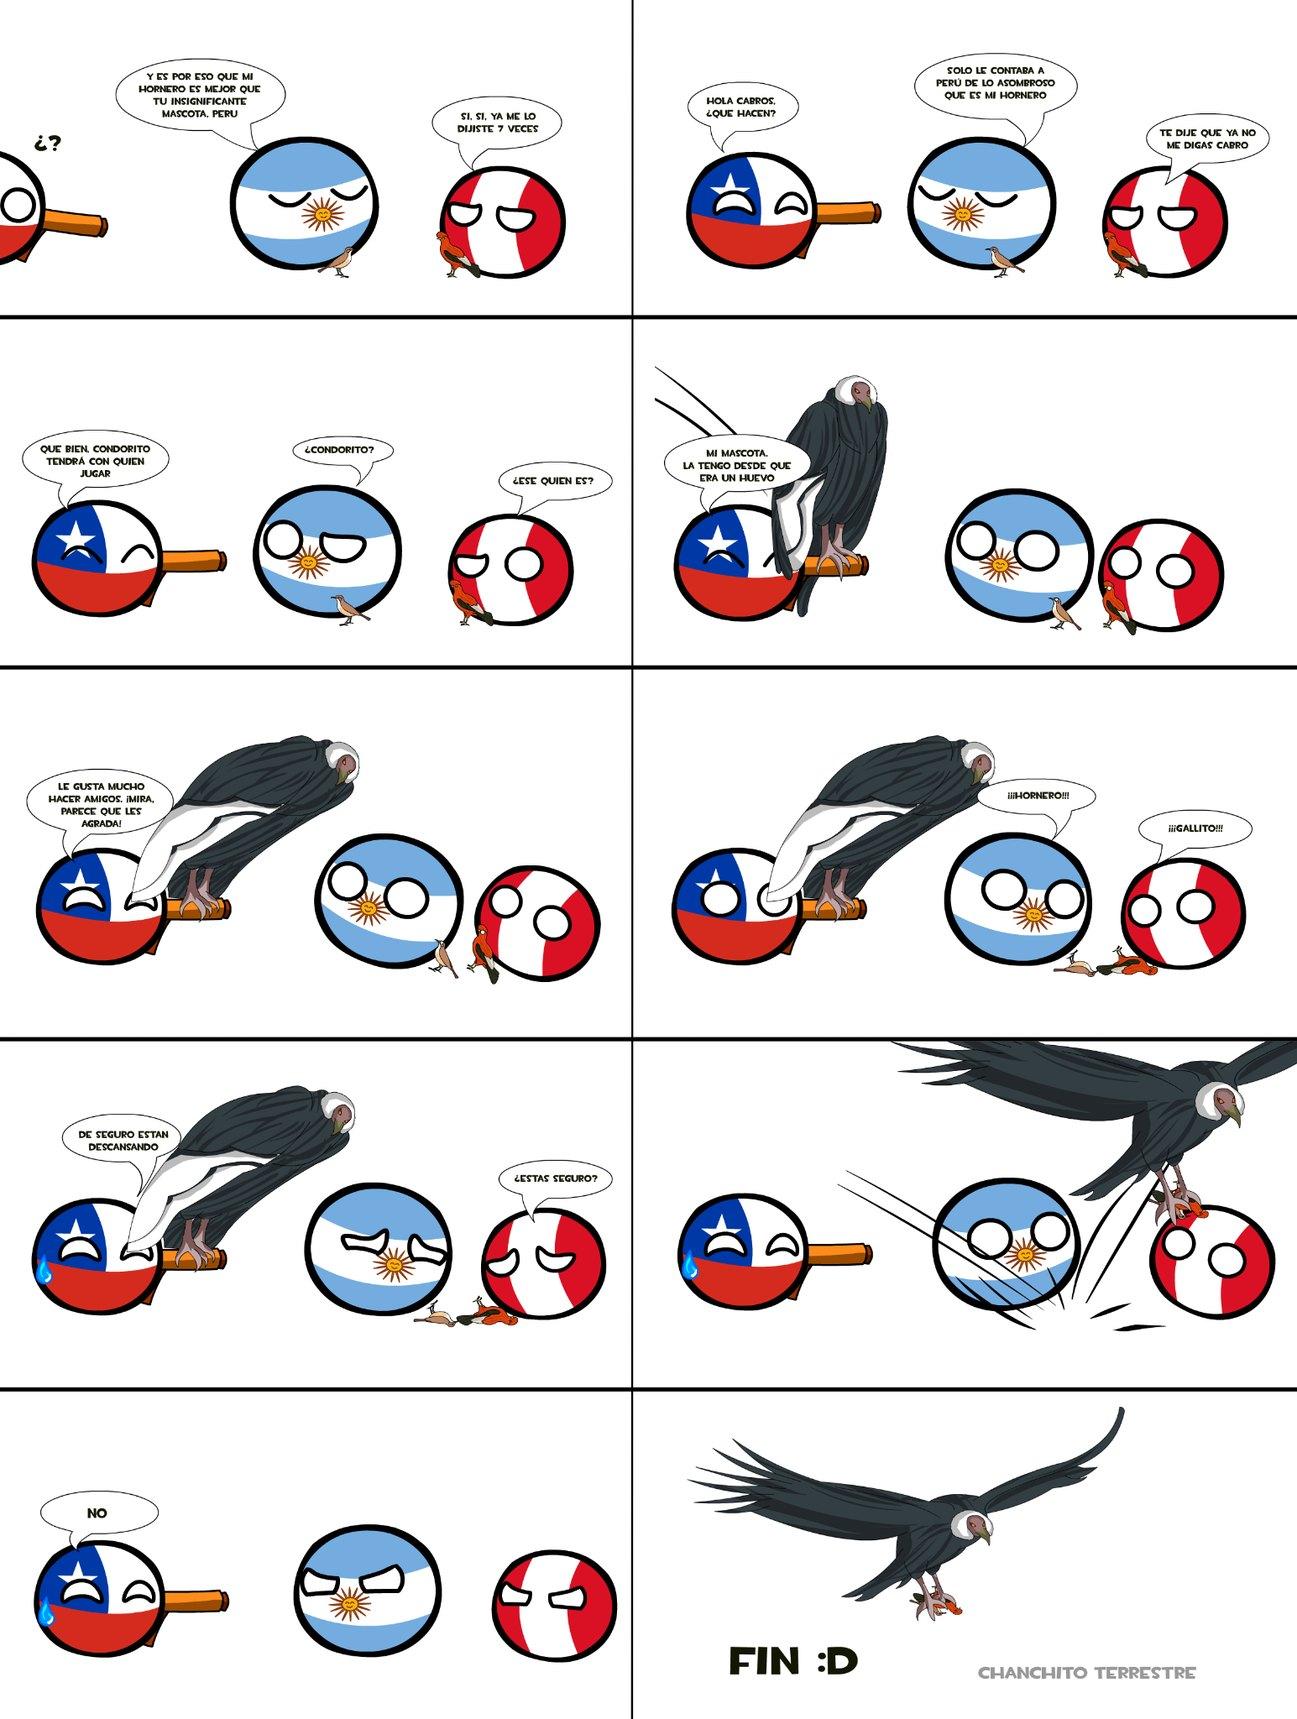 Condor fot the win - meme